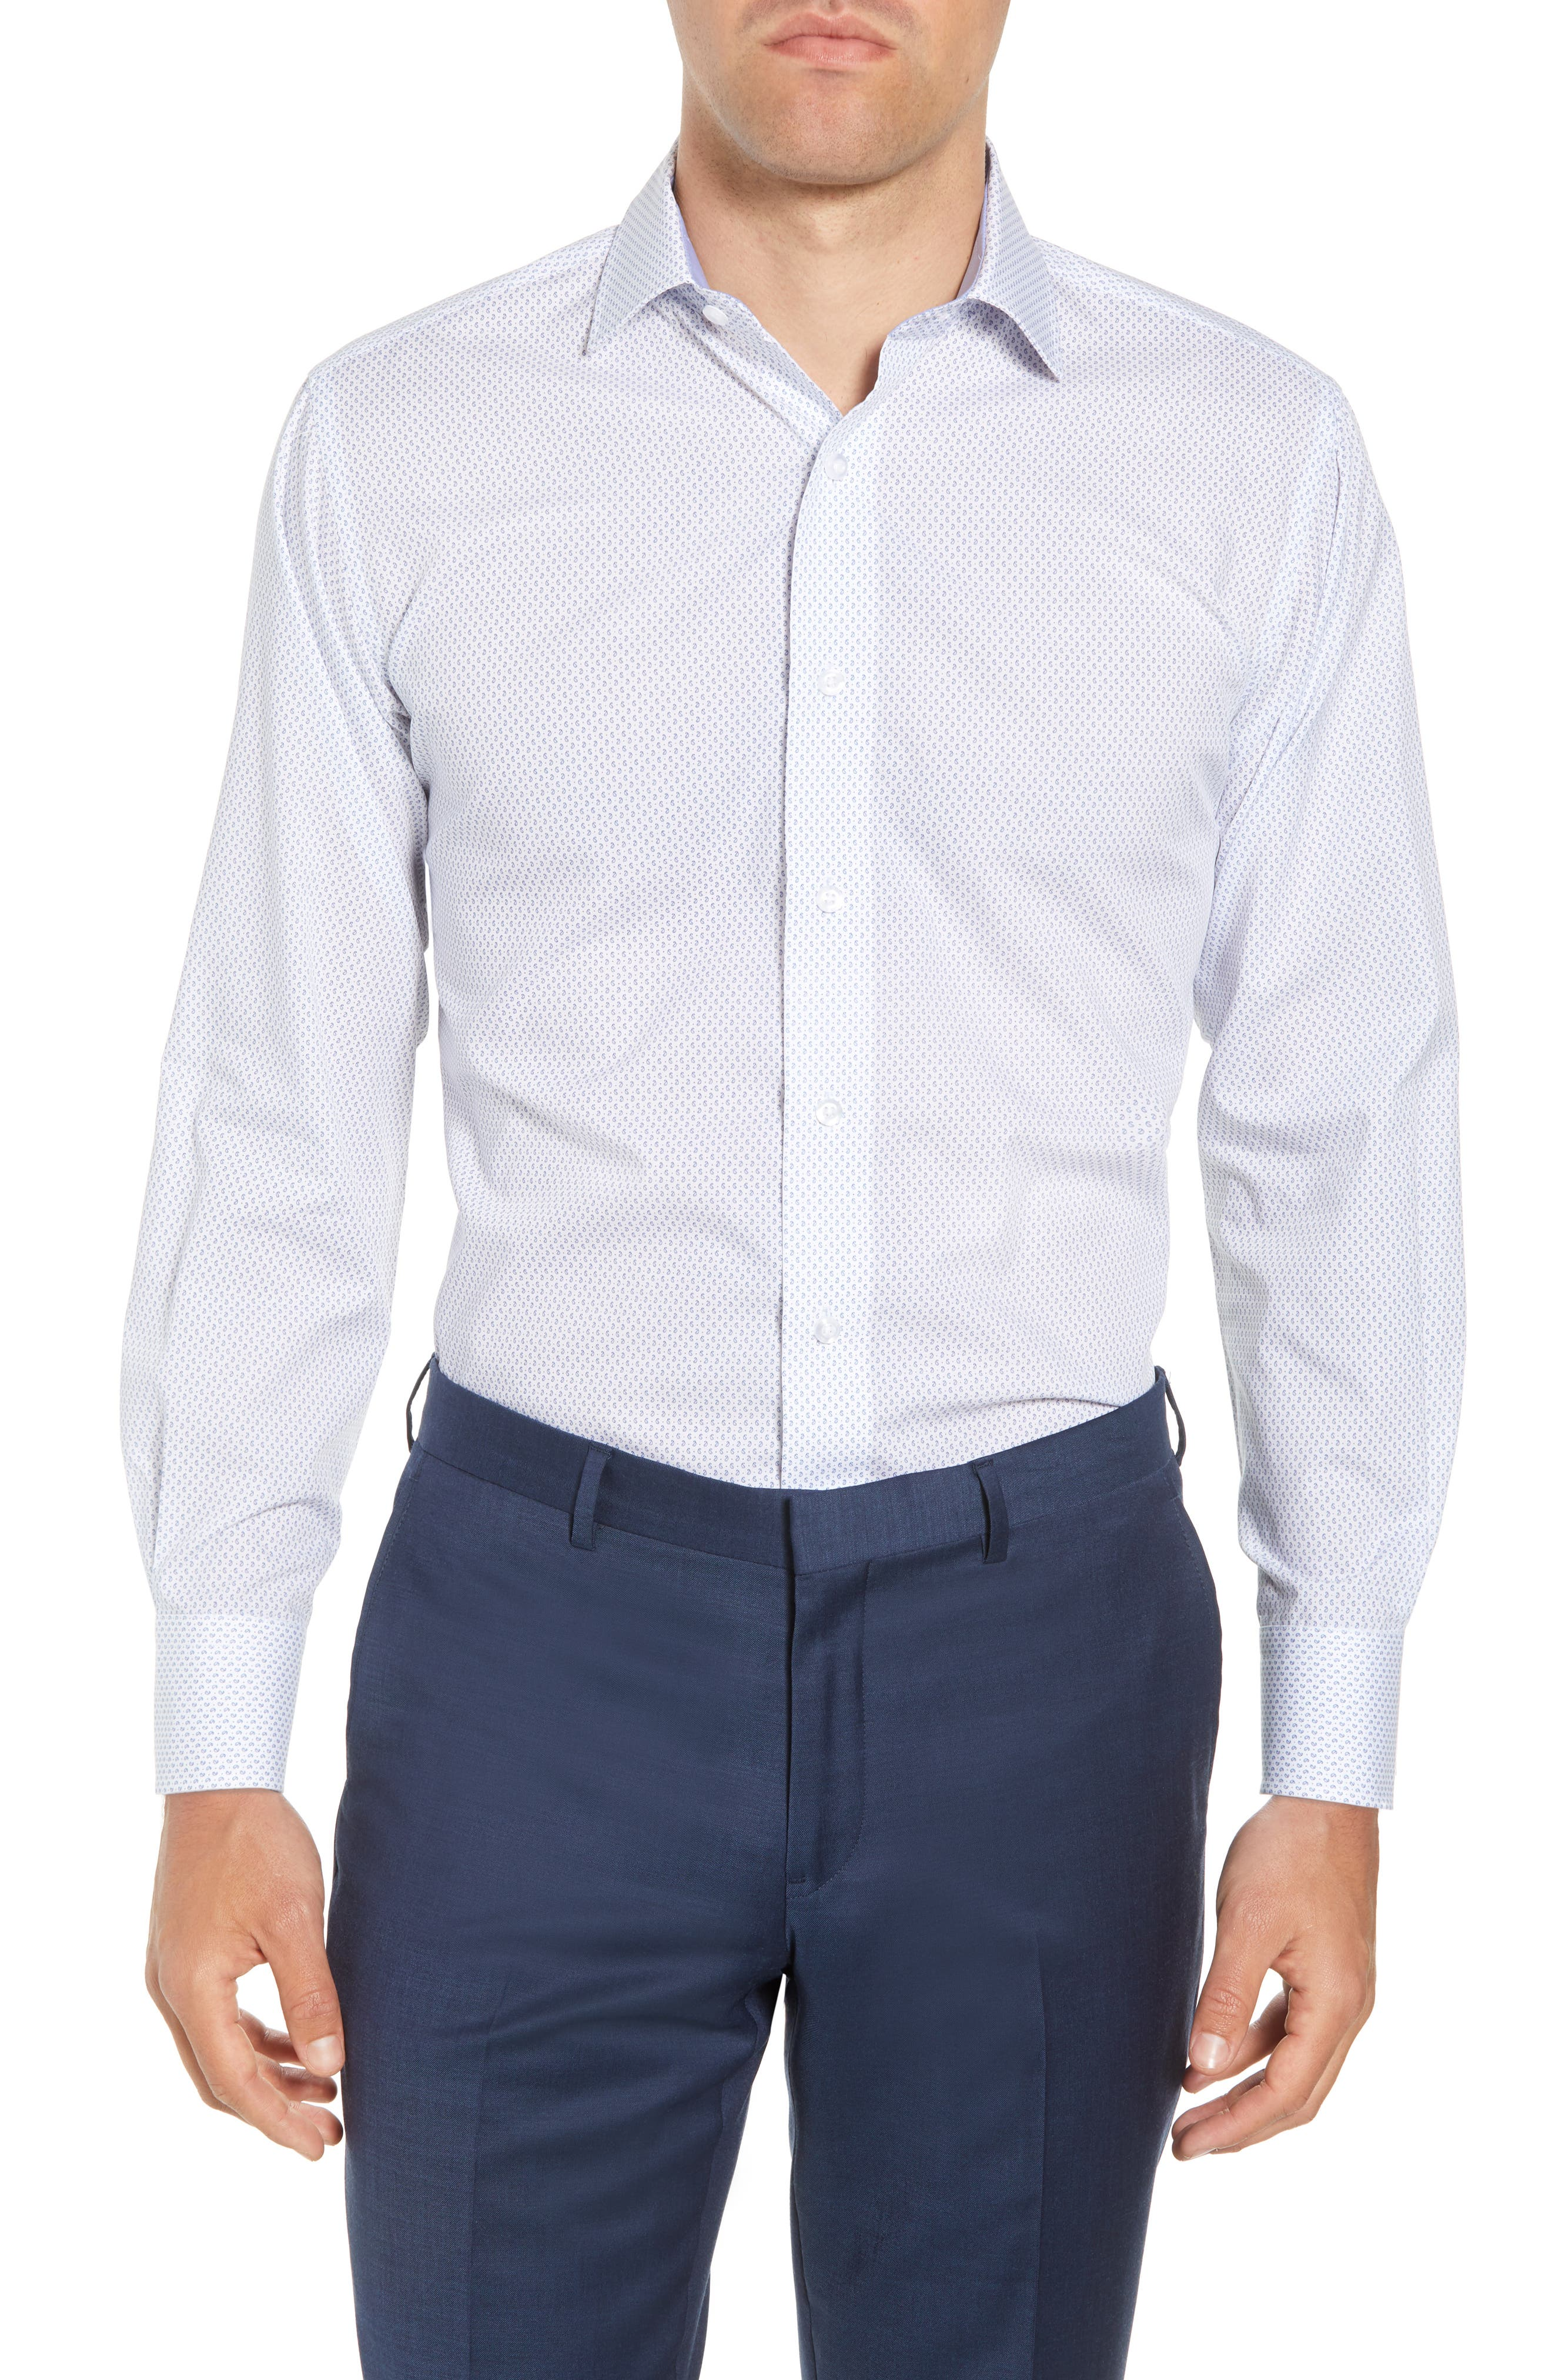 LORENZO UOMO,                             Trim Fit Paisley Dress Shirt,                             Main thumbnail 1, color,                             400